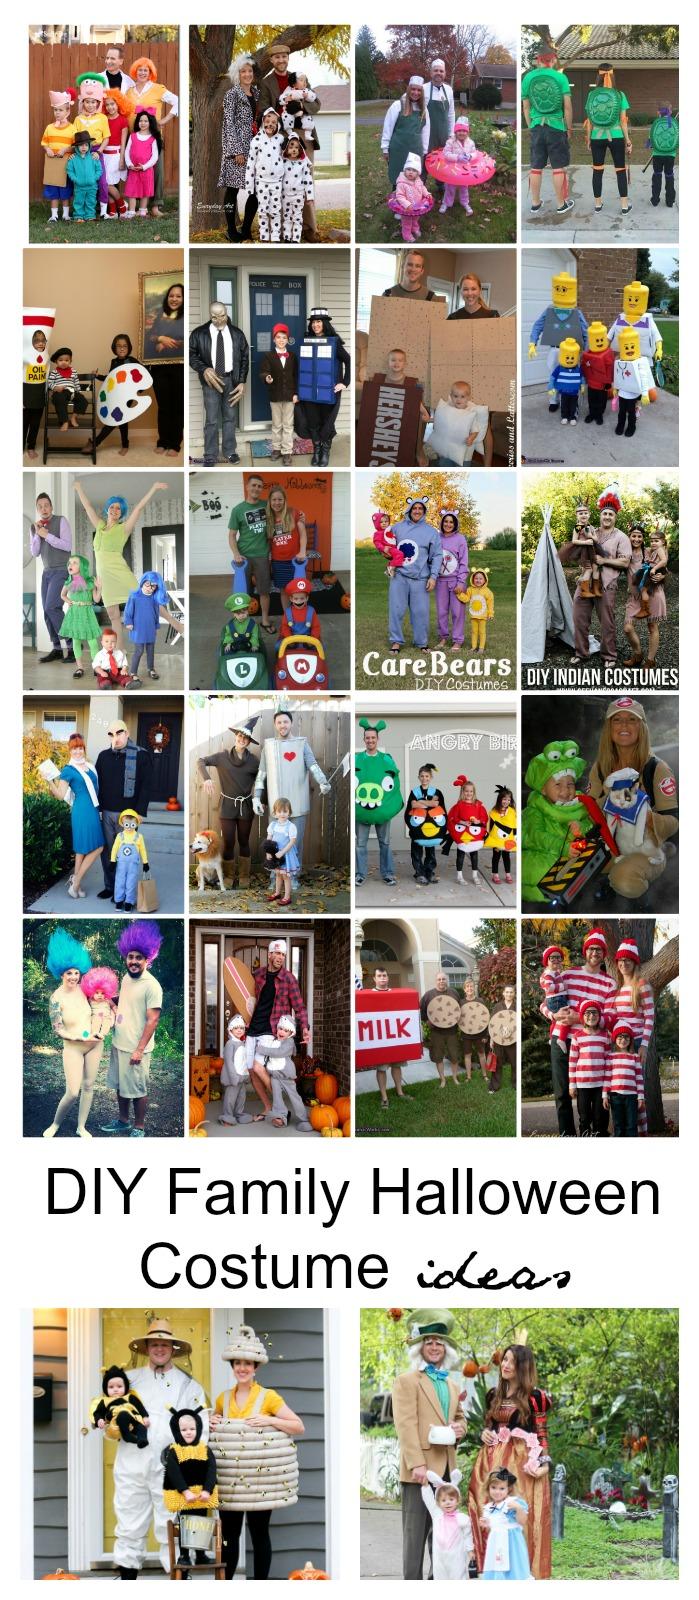 DIY-Family-Halloween-Costume-Ideas-Pin